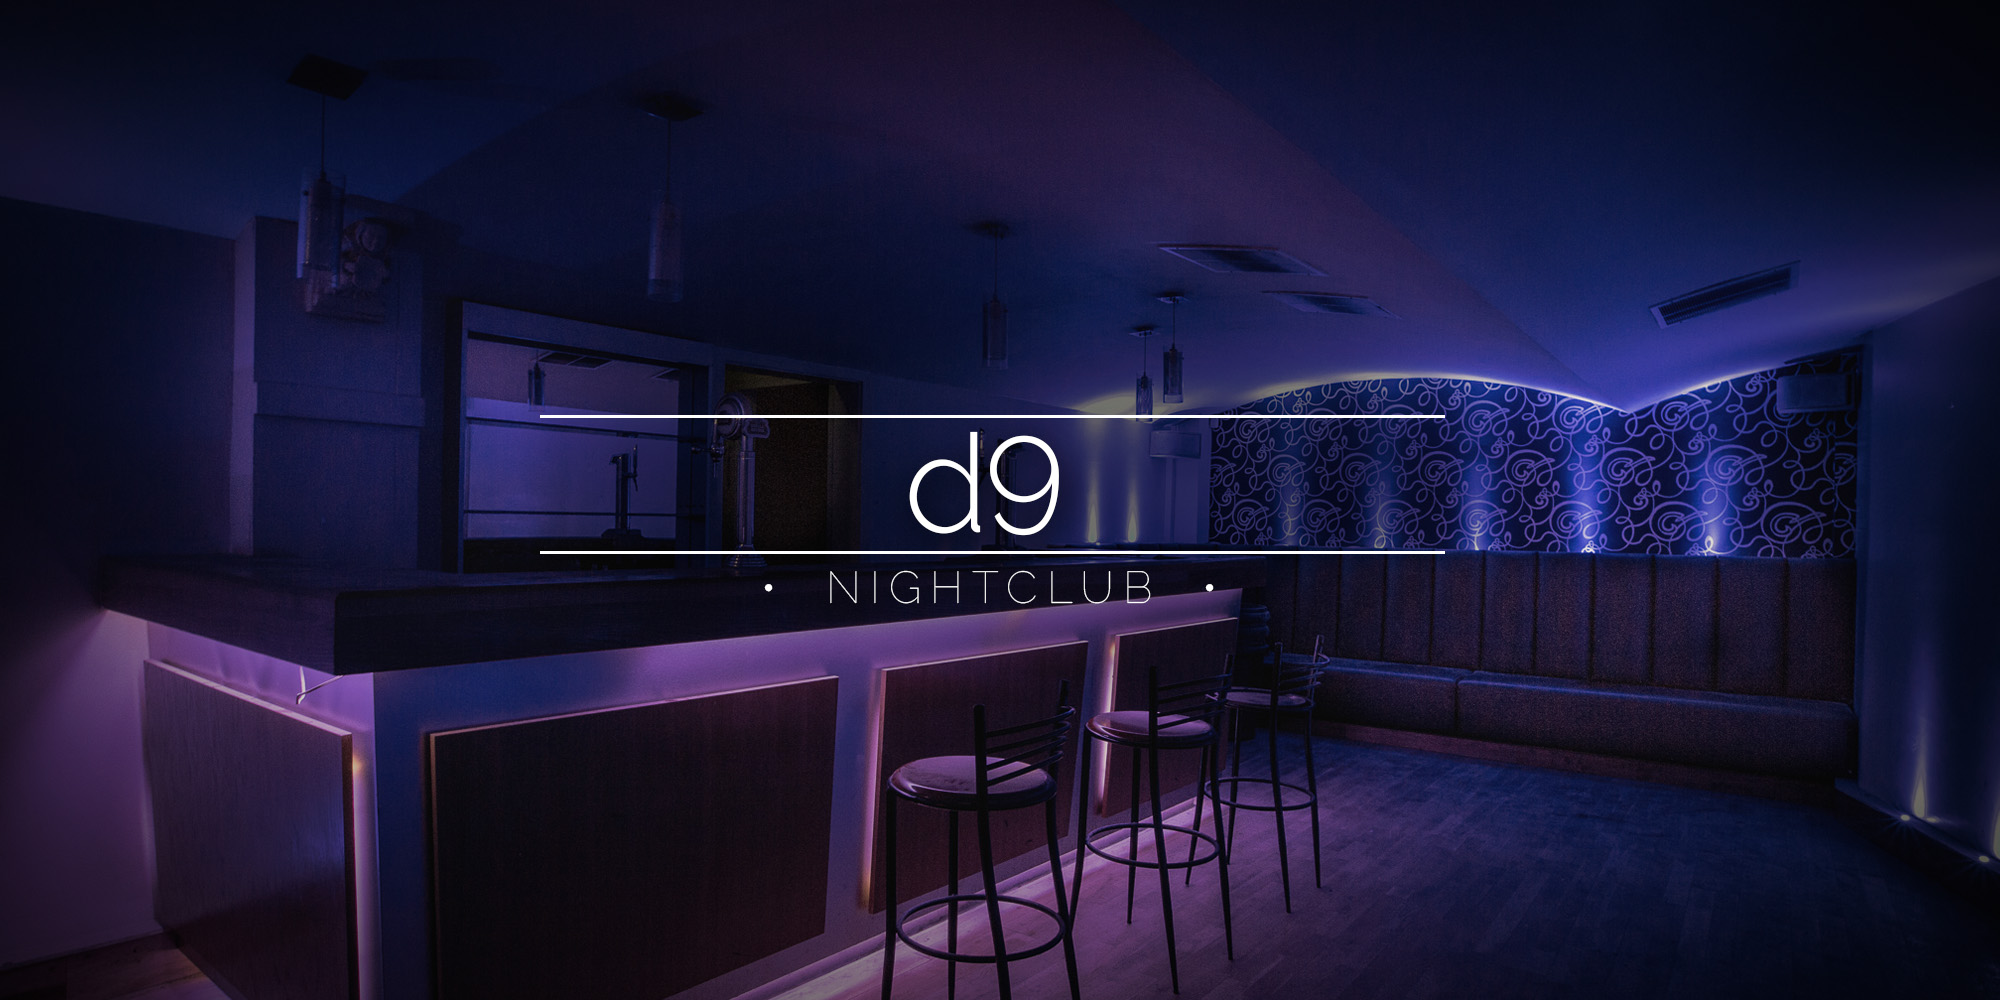 D9 Nightclub Leicester